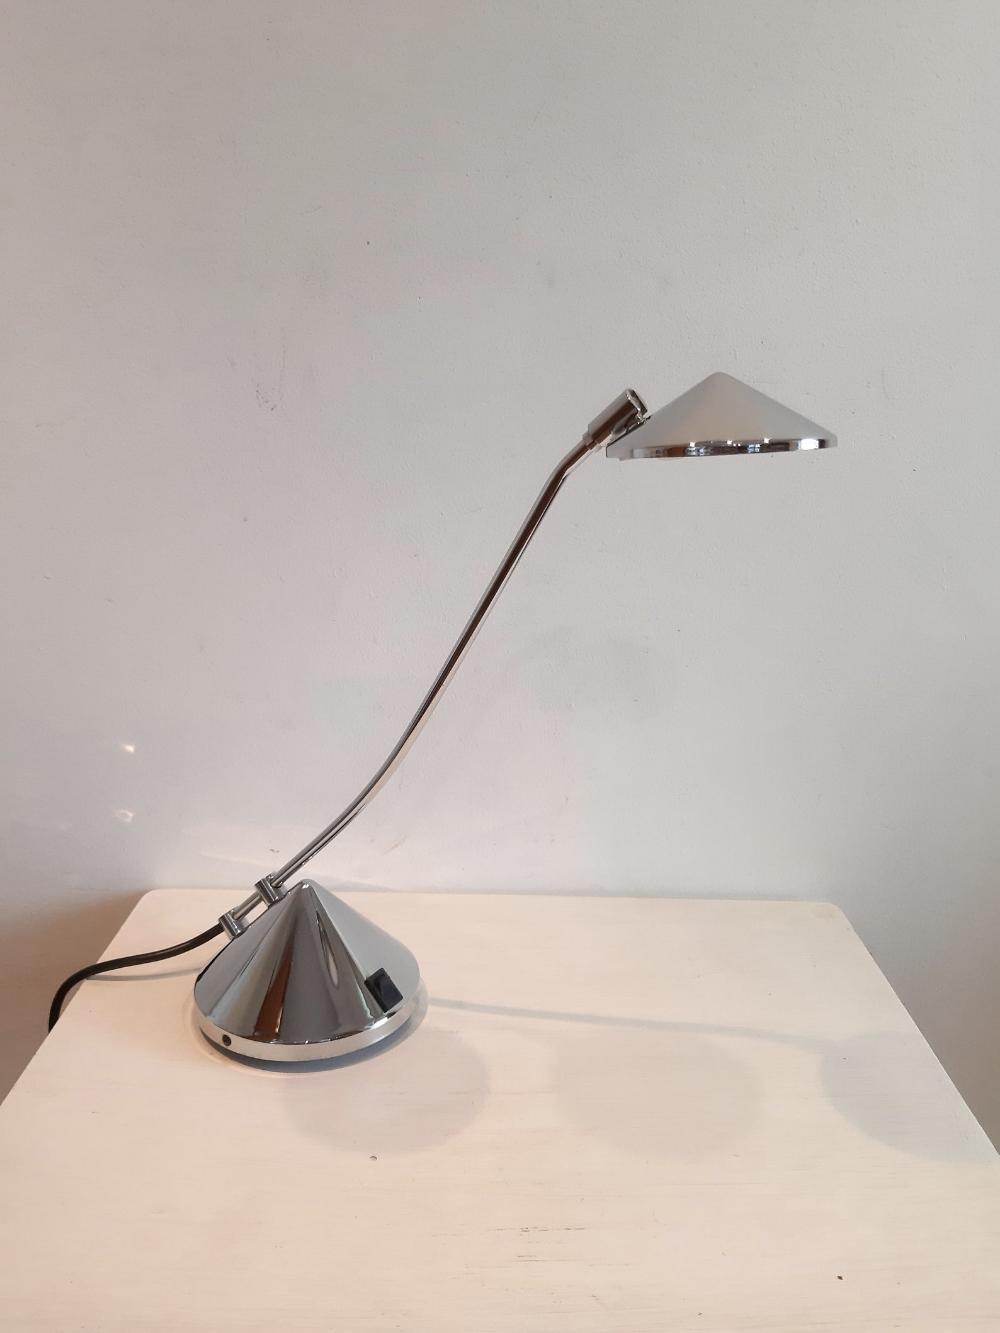 Vintage Stainless Steel Chrome Desk Lamp Office Lamp Table Lamp Reading Lamp Study Bedroom Desk 12v Lamp Circa 1990 S In 2020 Desk Lamp Table Lamp Lamp